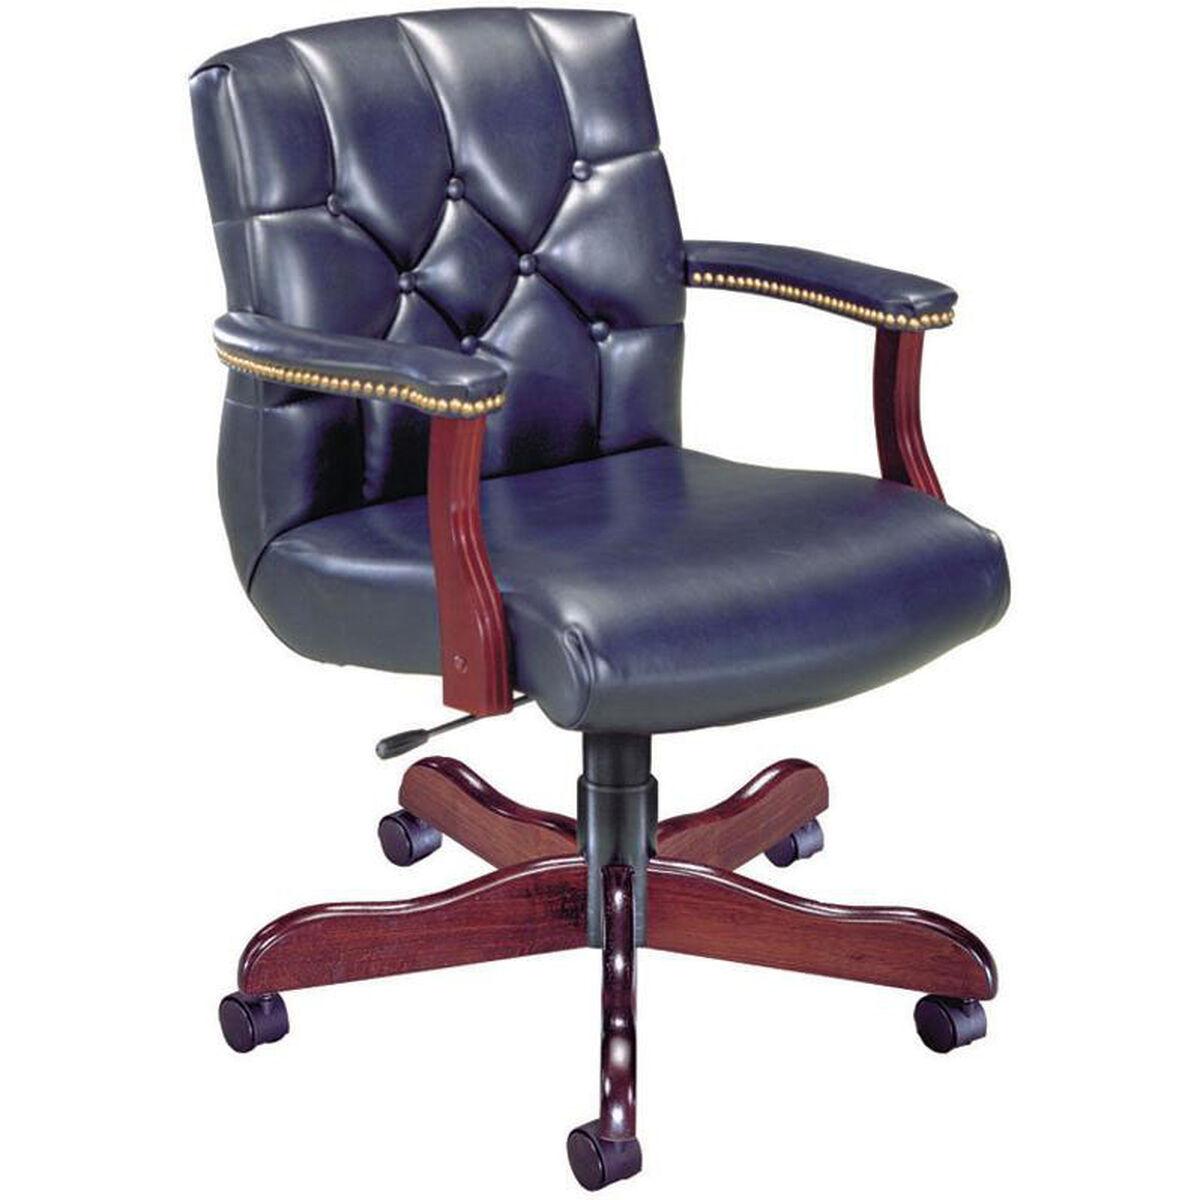 High Point Furniture Industries 4837 Hpf 4837